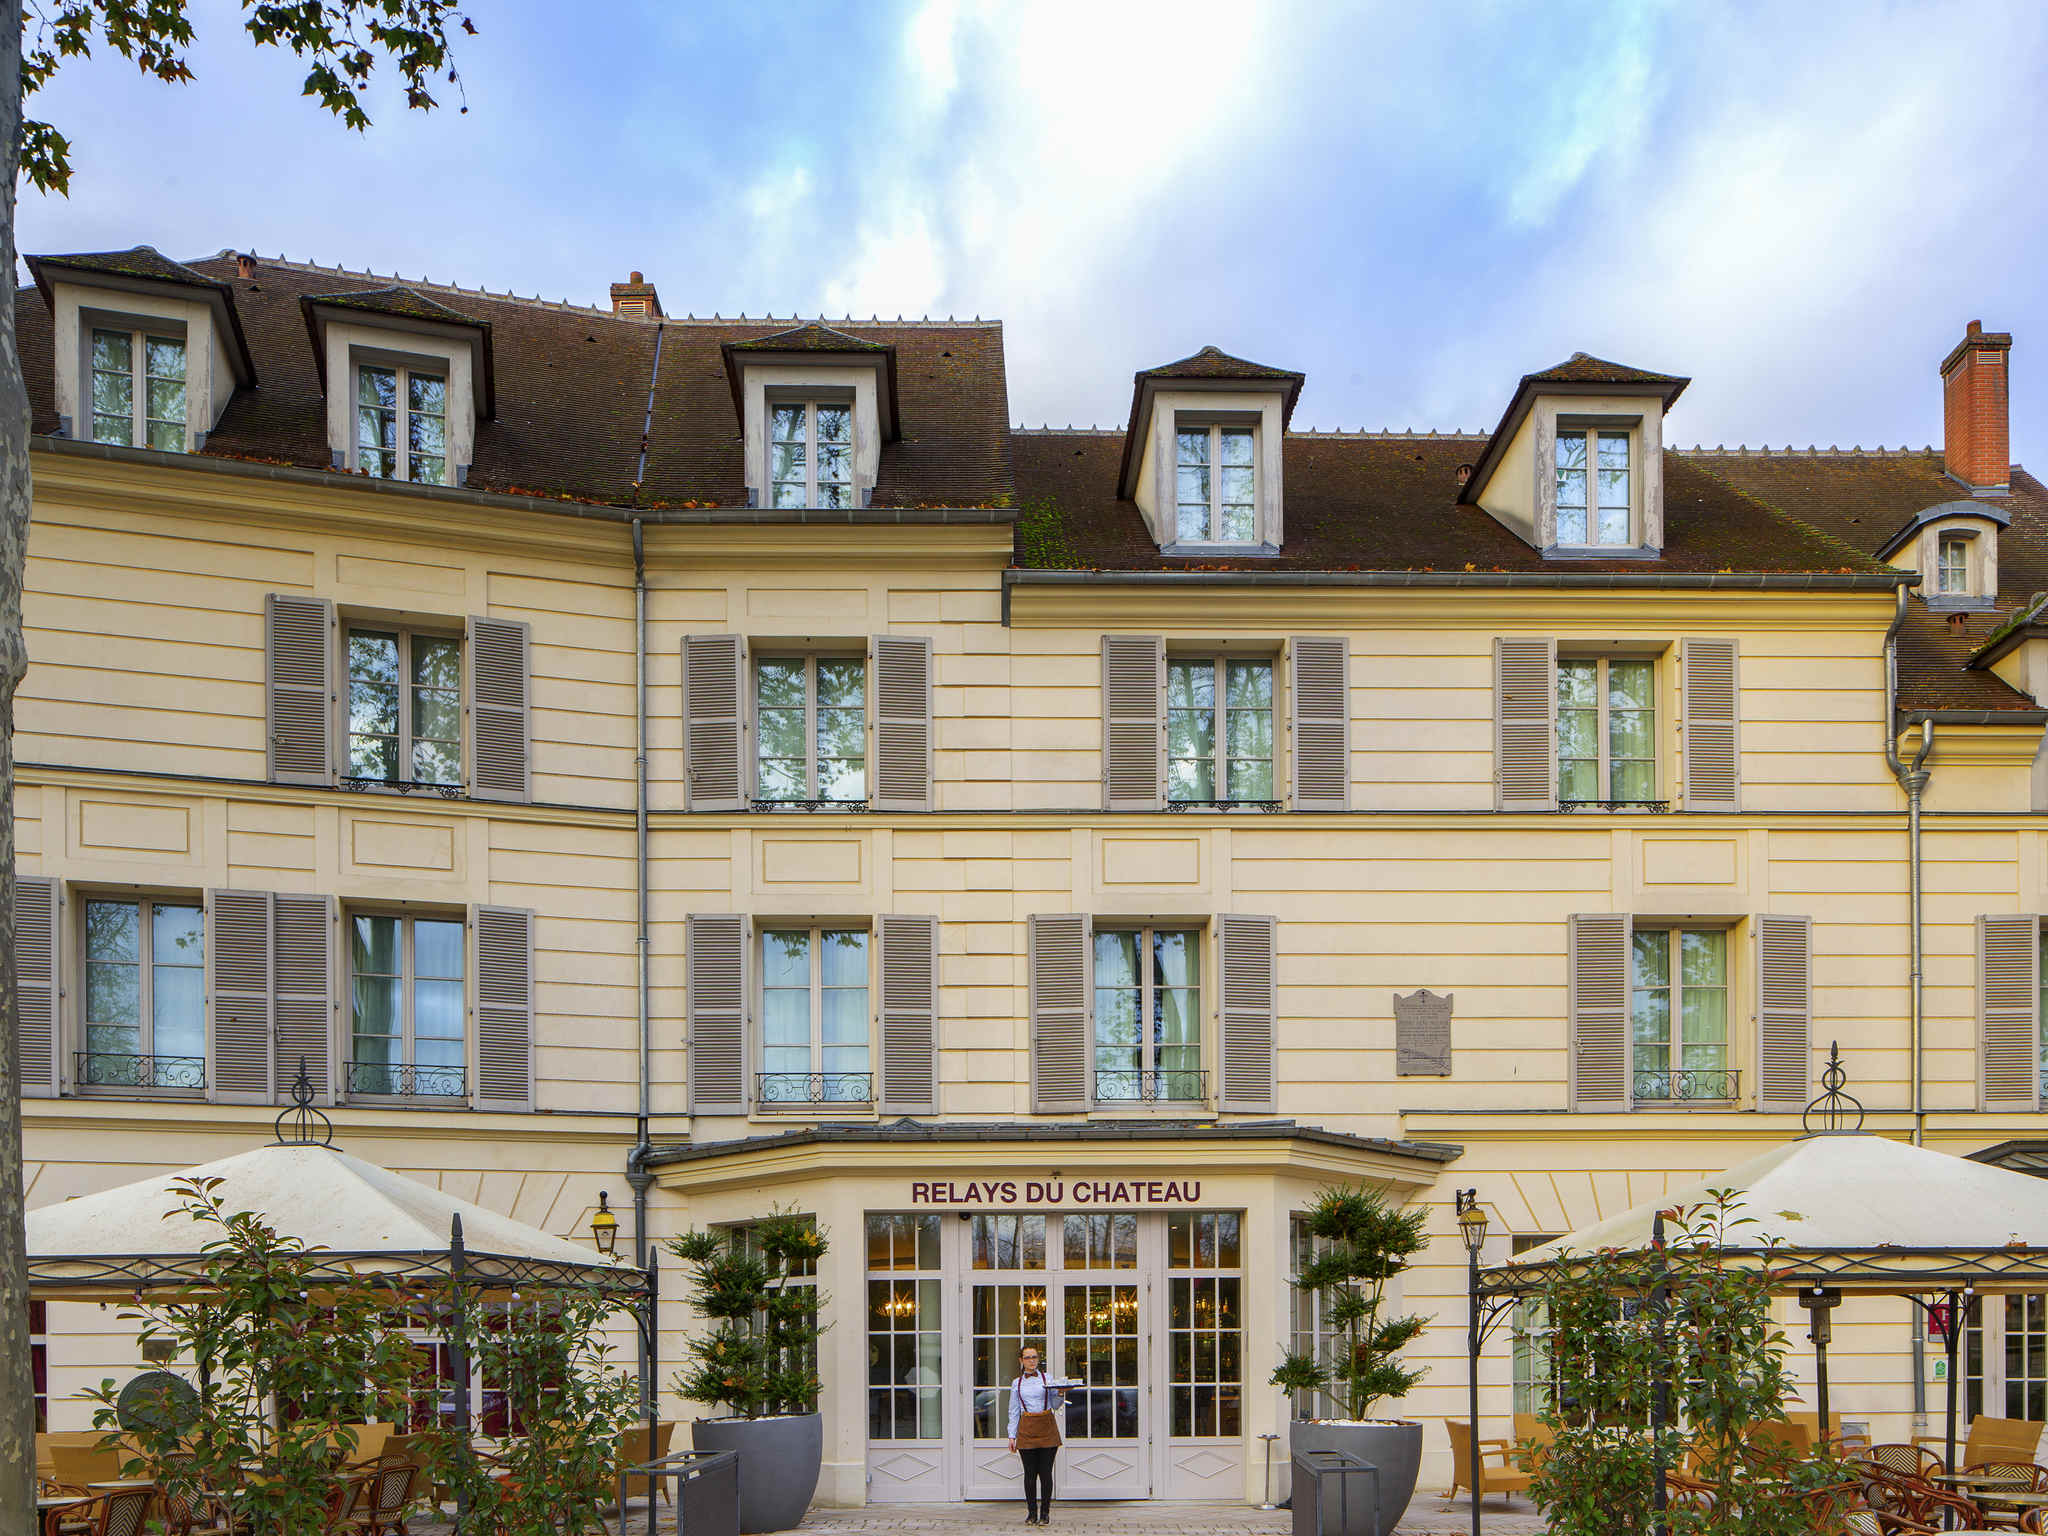 Hotell – Hôtel Mercure Rambouillet Relays du Château